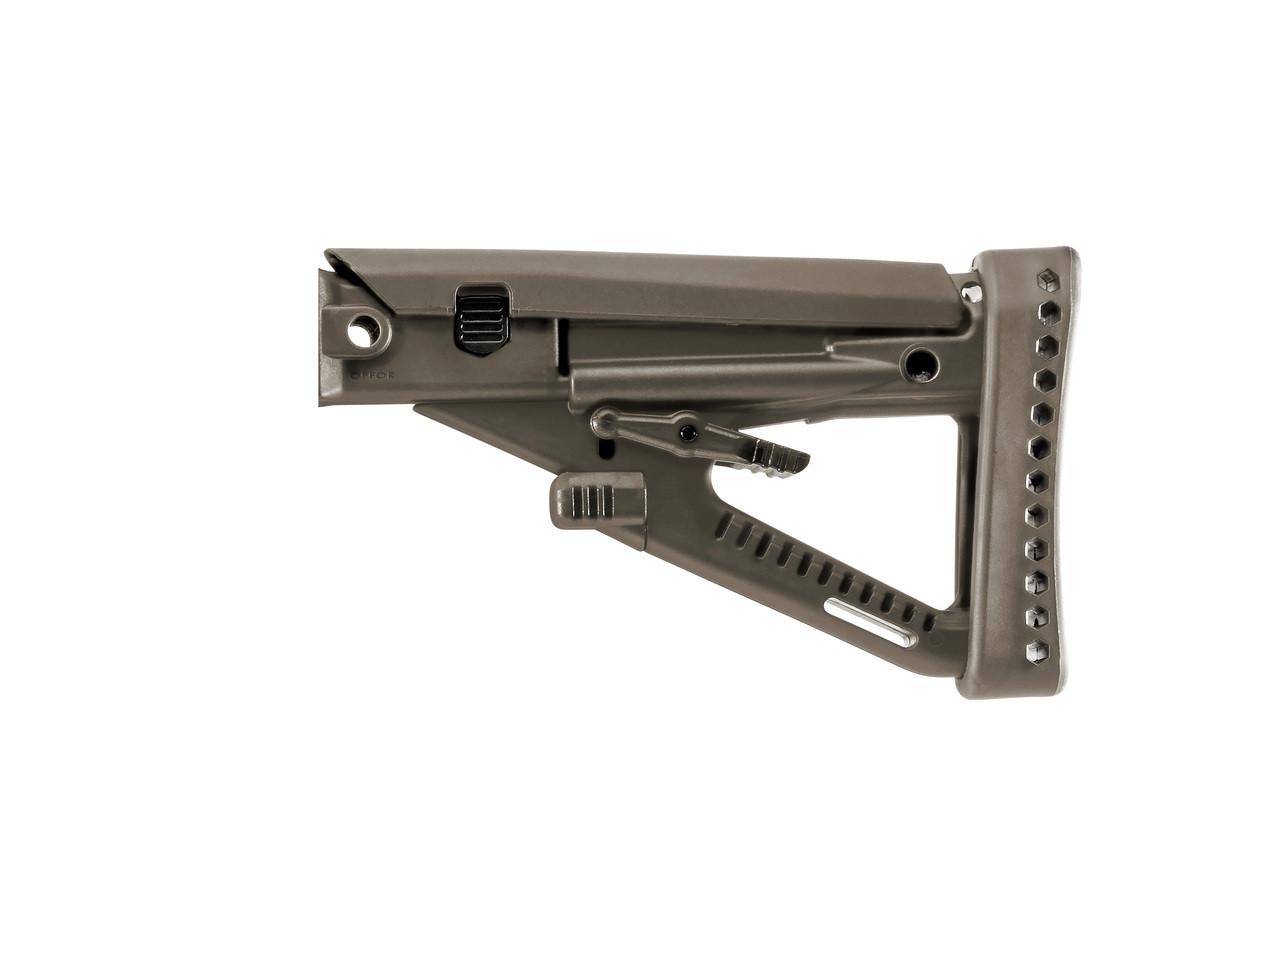 Archangel® OPFOR® AK-series (4) Position Adjustable Buttstock -  Olive Drab Polymer